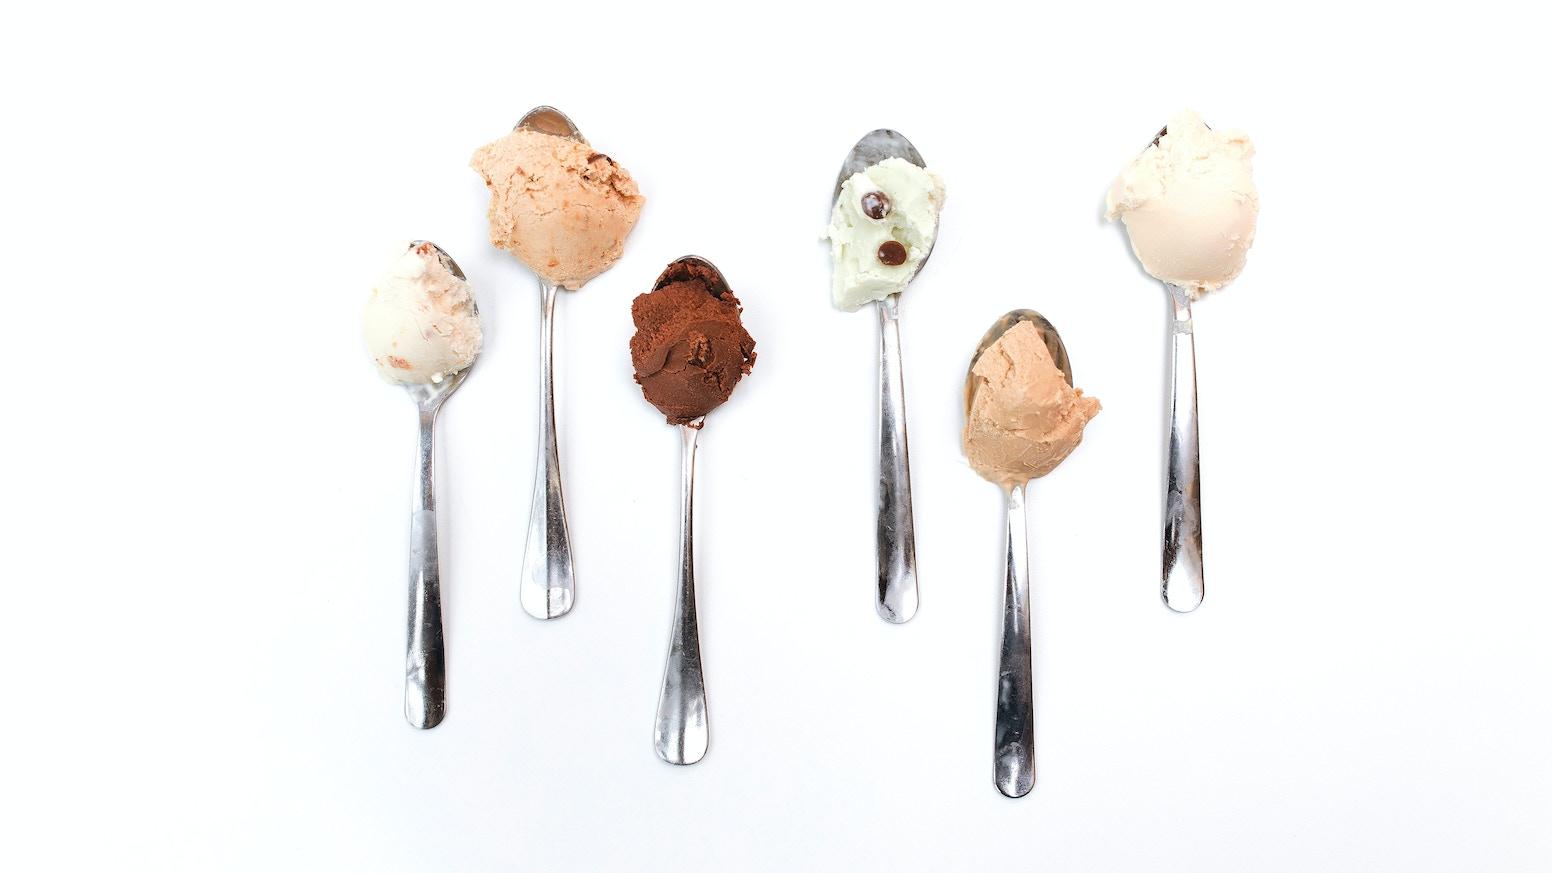 Keto Pint A New Kind Of Ice Cream By Keto Pint Kickstarter